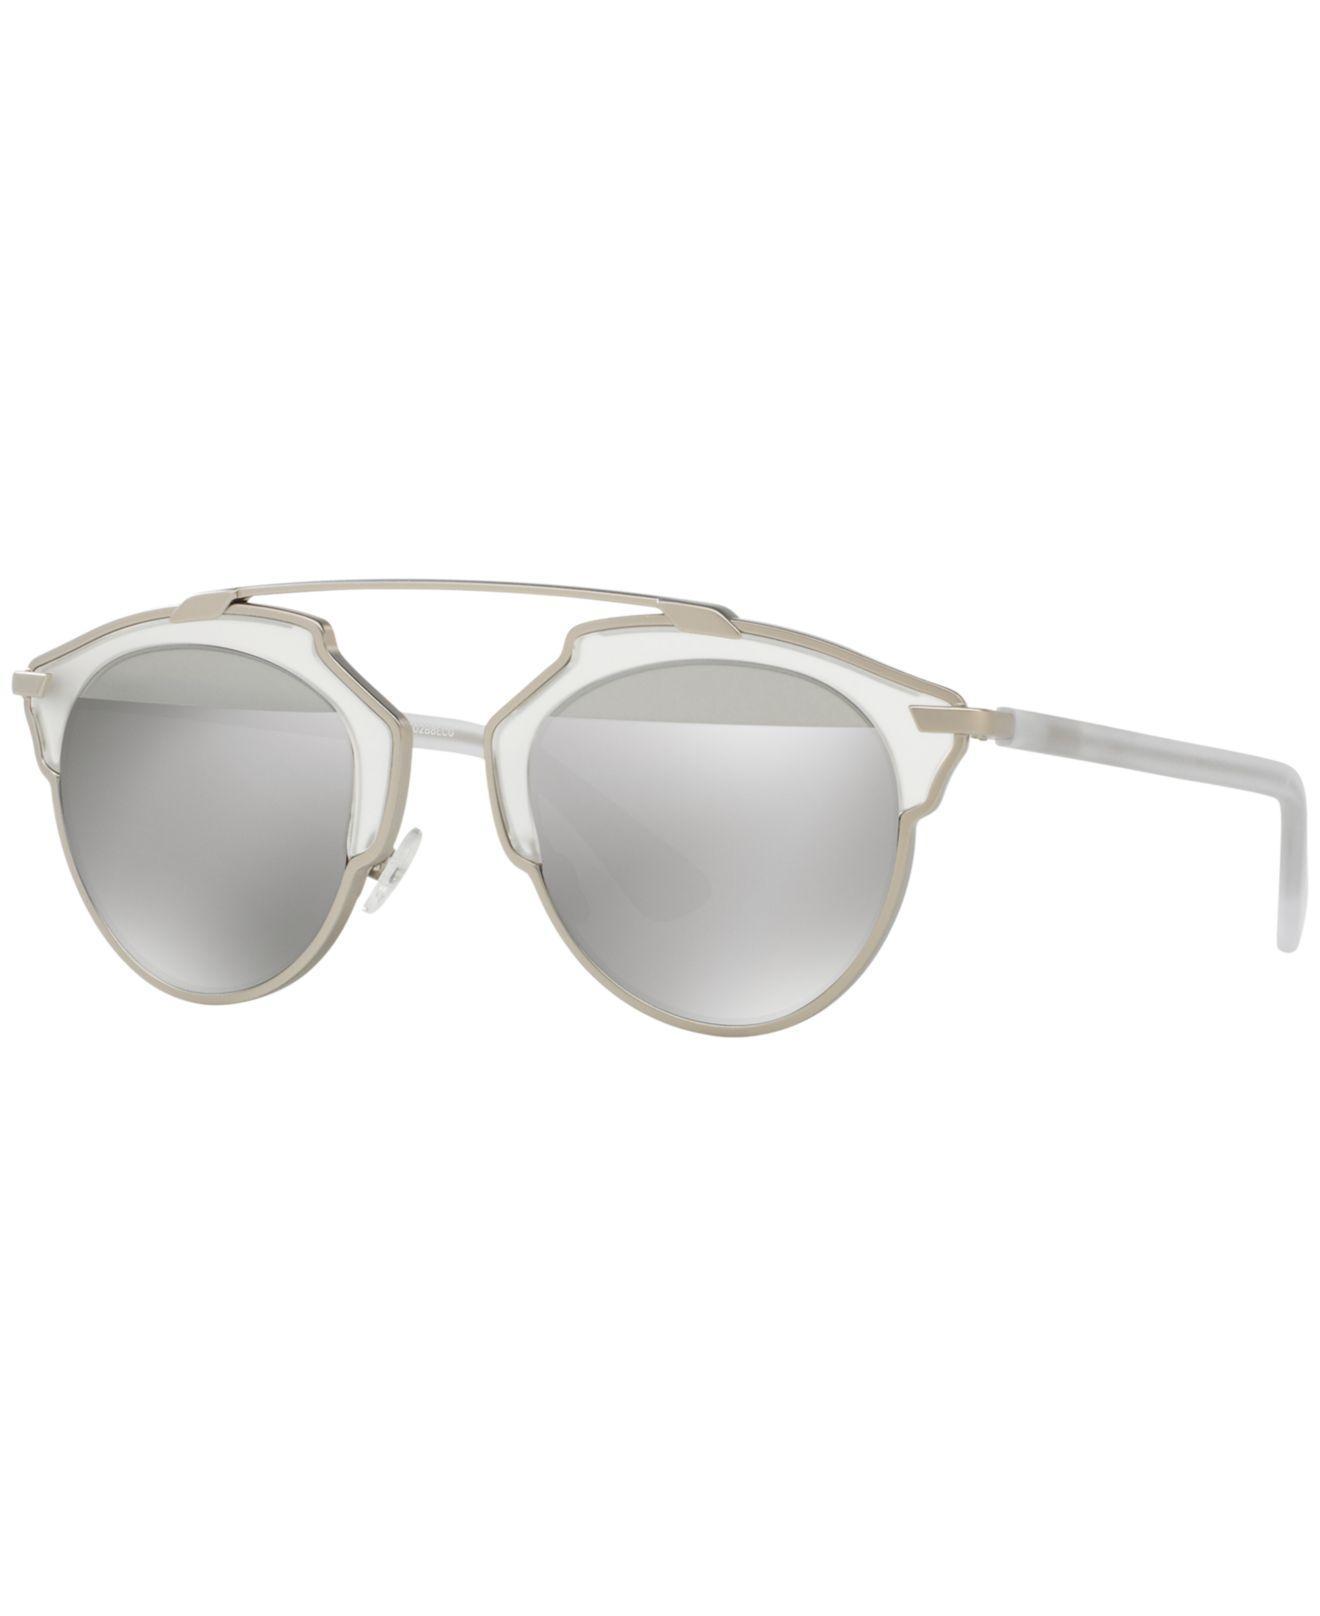 07f0ff8cdf3 Dior. Women s Metallic Sunglasses